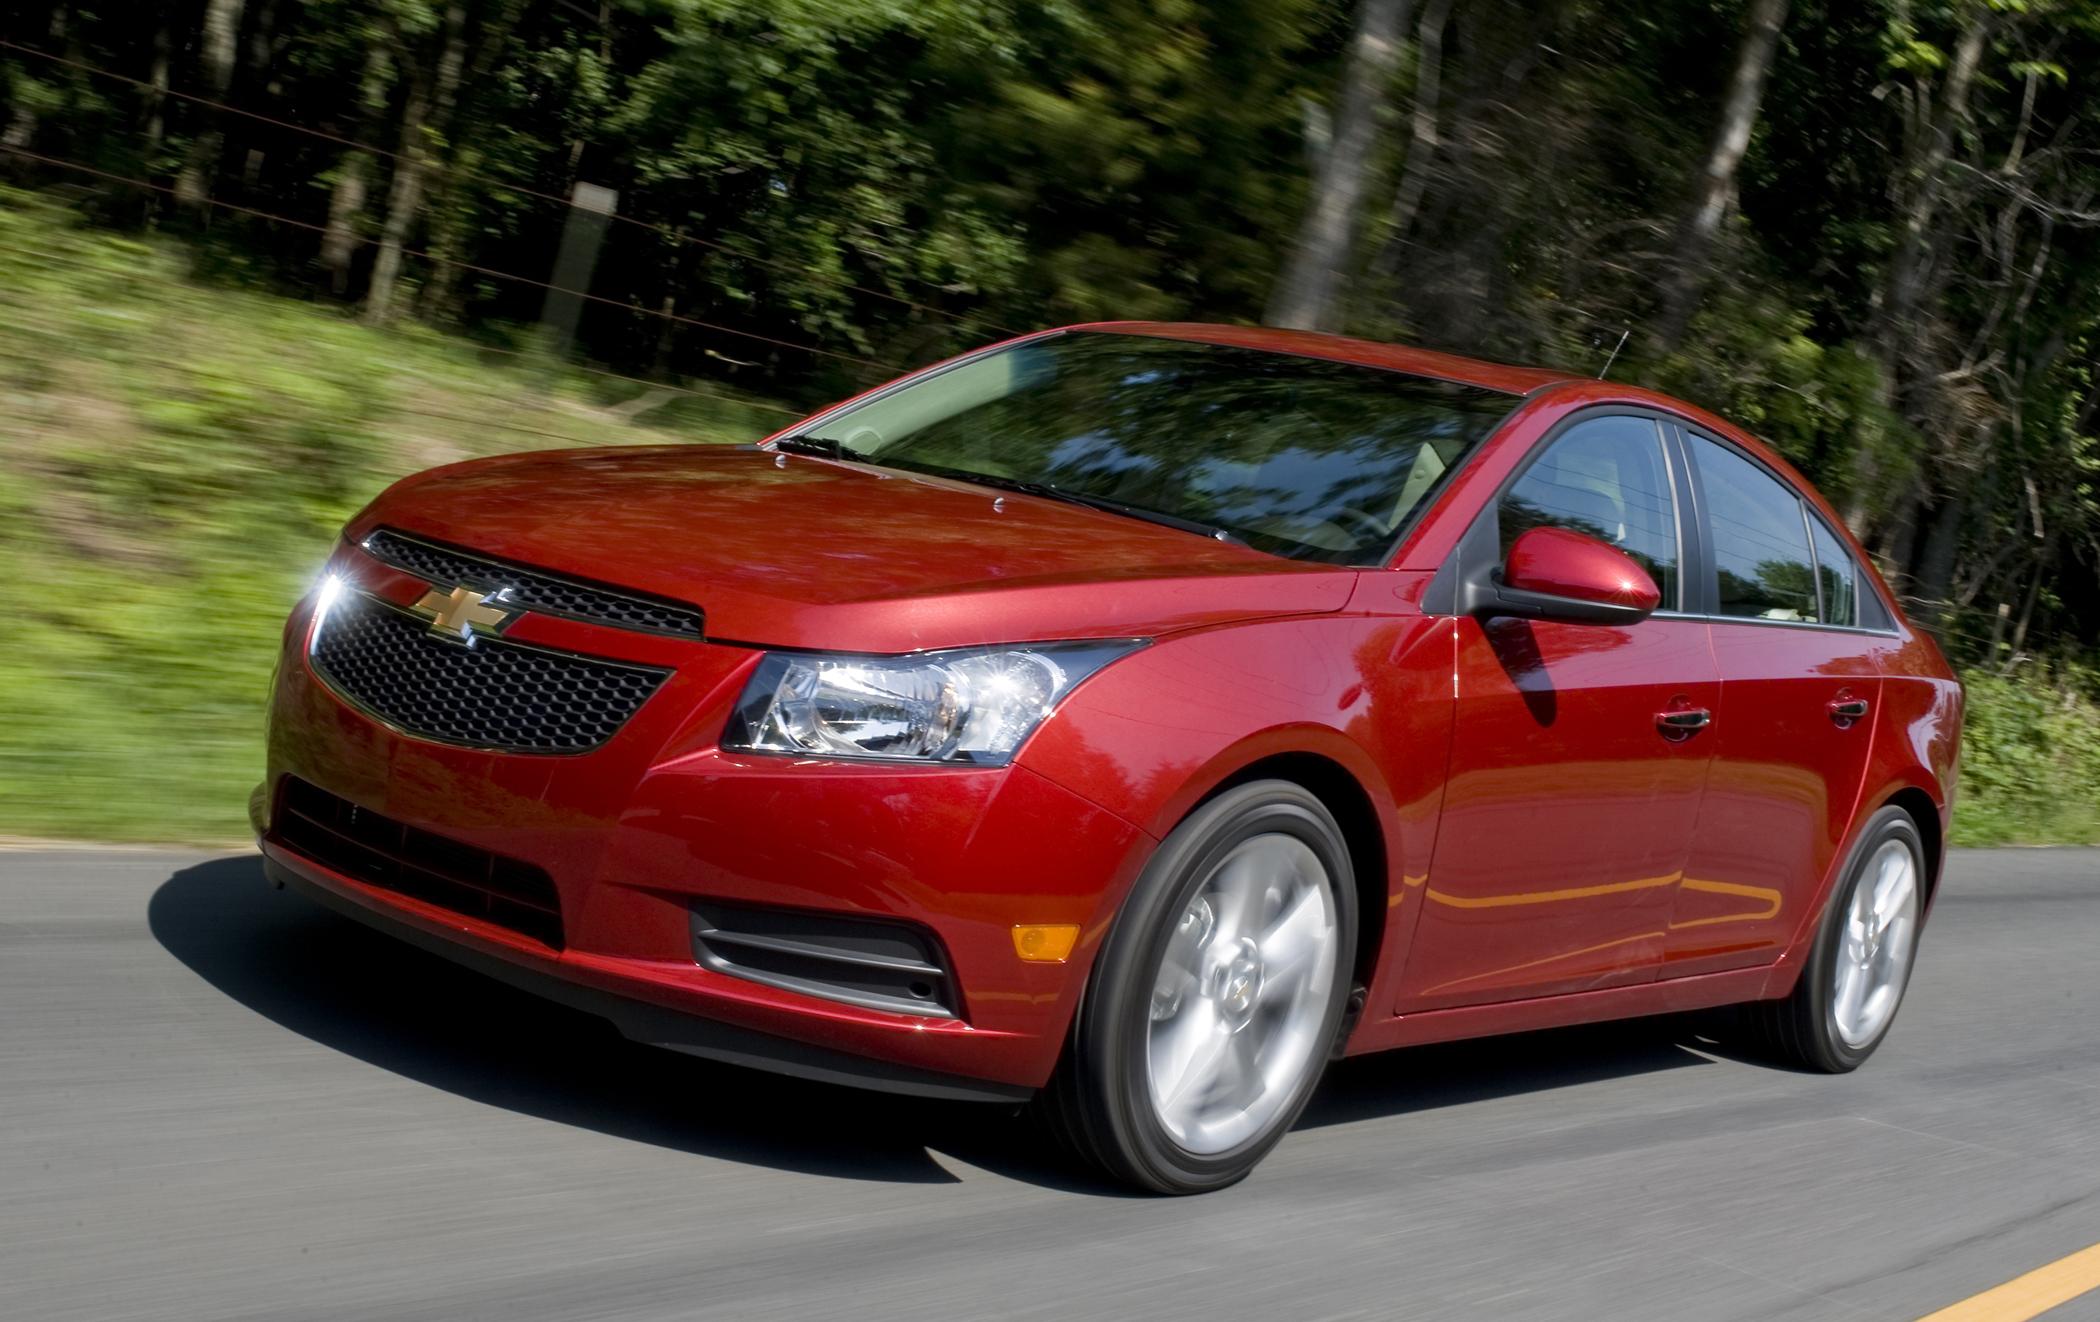 https://www.groovecar.com/media/images/articles/2011/01/new-on-wheels/2011-chevrolet-cruze-offers-broad-compact-sedan-lineup/2011-chevrolet-cruze-offers-broad-compact-sedan-lineup-1.jpg